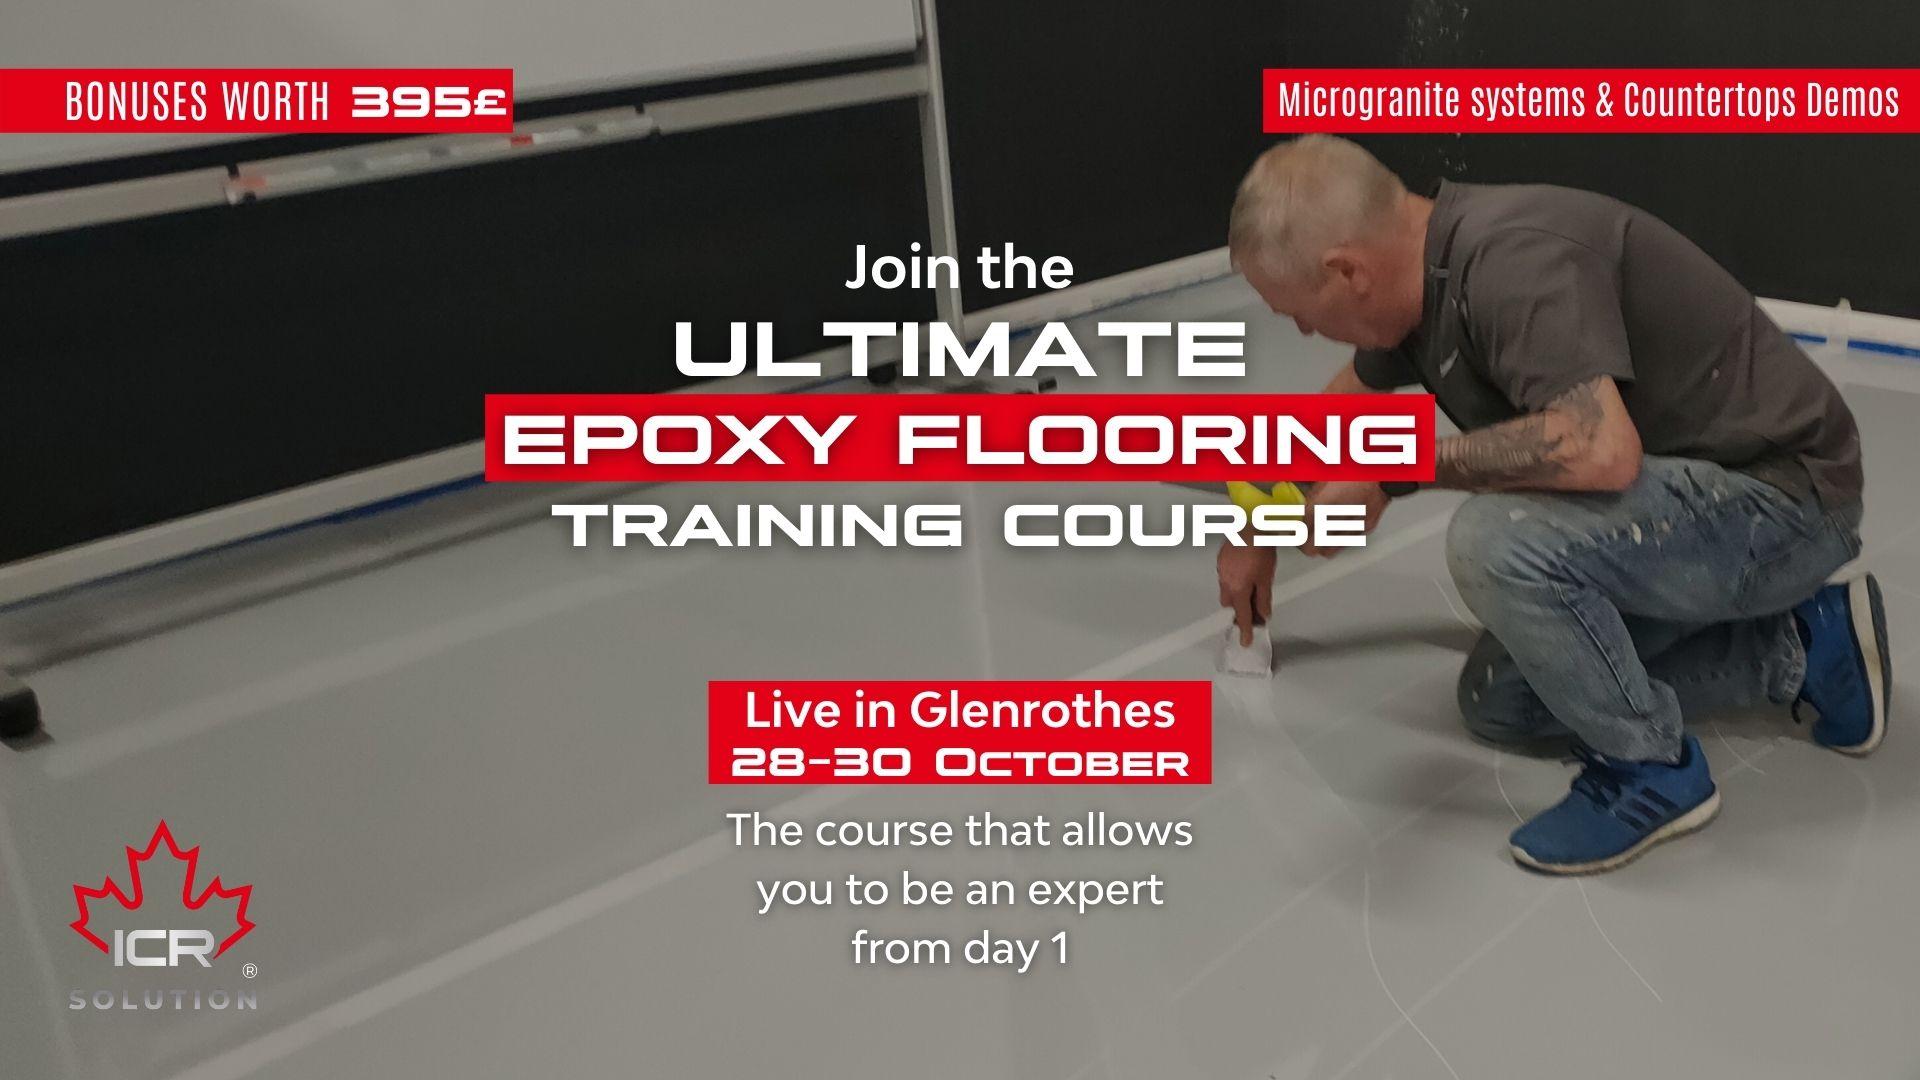 Ultimate Epoxy Flooring Training Course